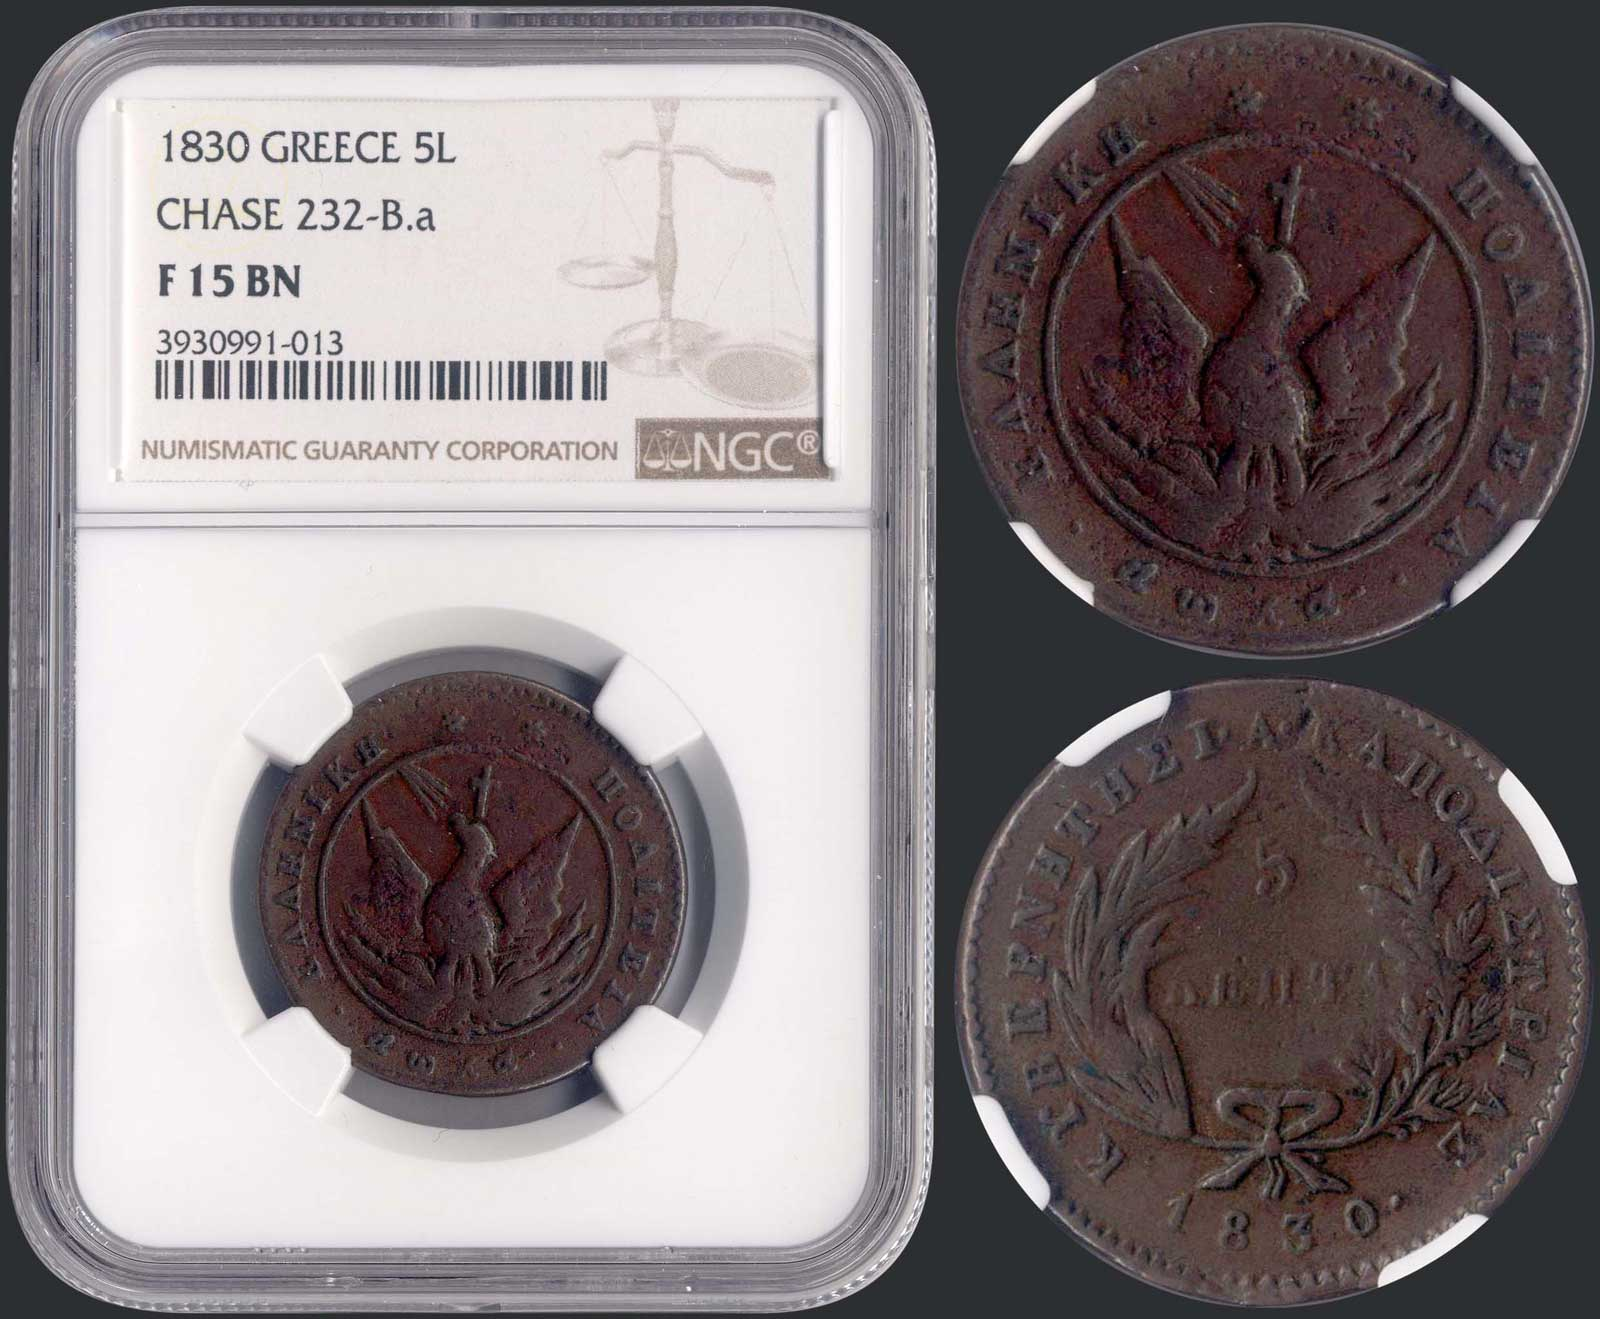 Lot 9018 - GREECE-  COINS & TOKENS governor capodistrias -  A. Karamitsos Public & LIVE Bid Auction 606 Coins, Medals & Banknotes